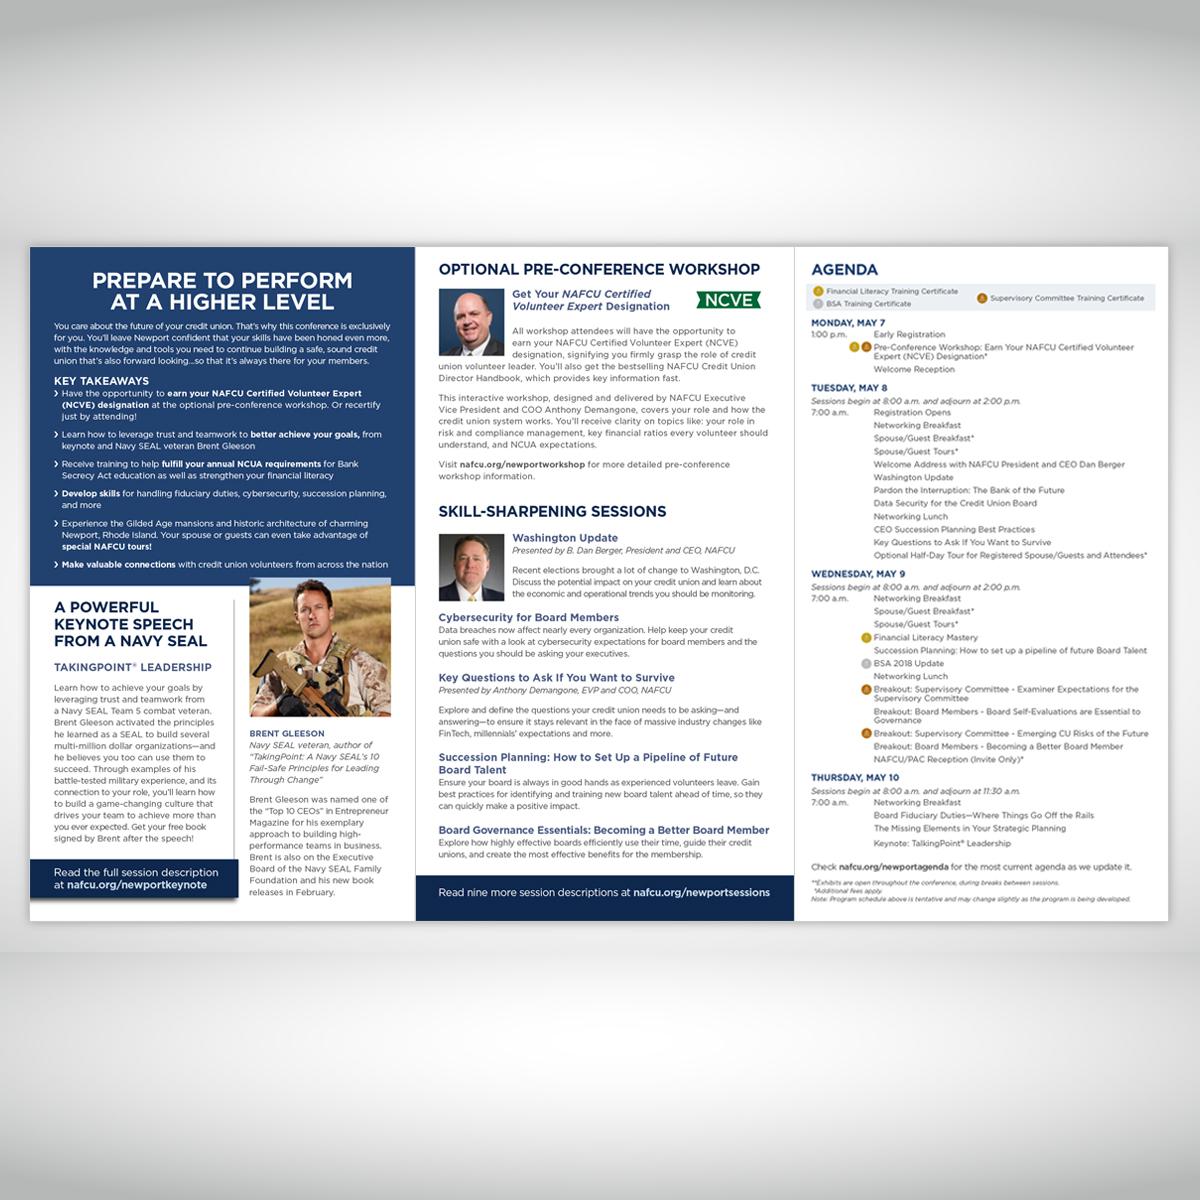 NAFCU Board of Directors 2018 Brochure (inside)